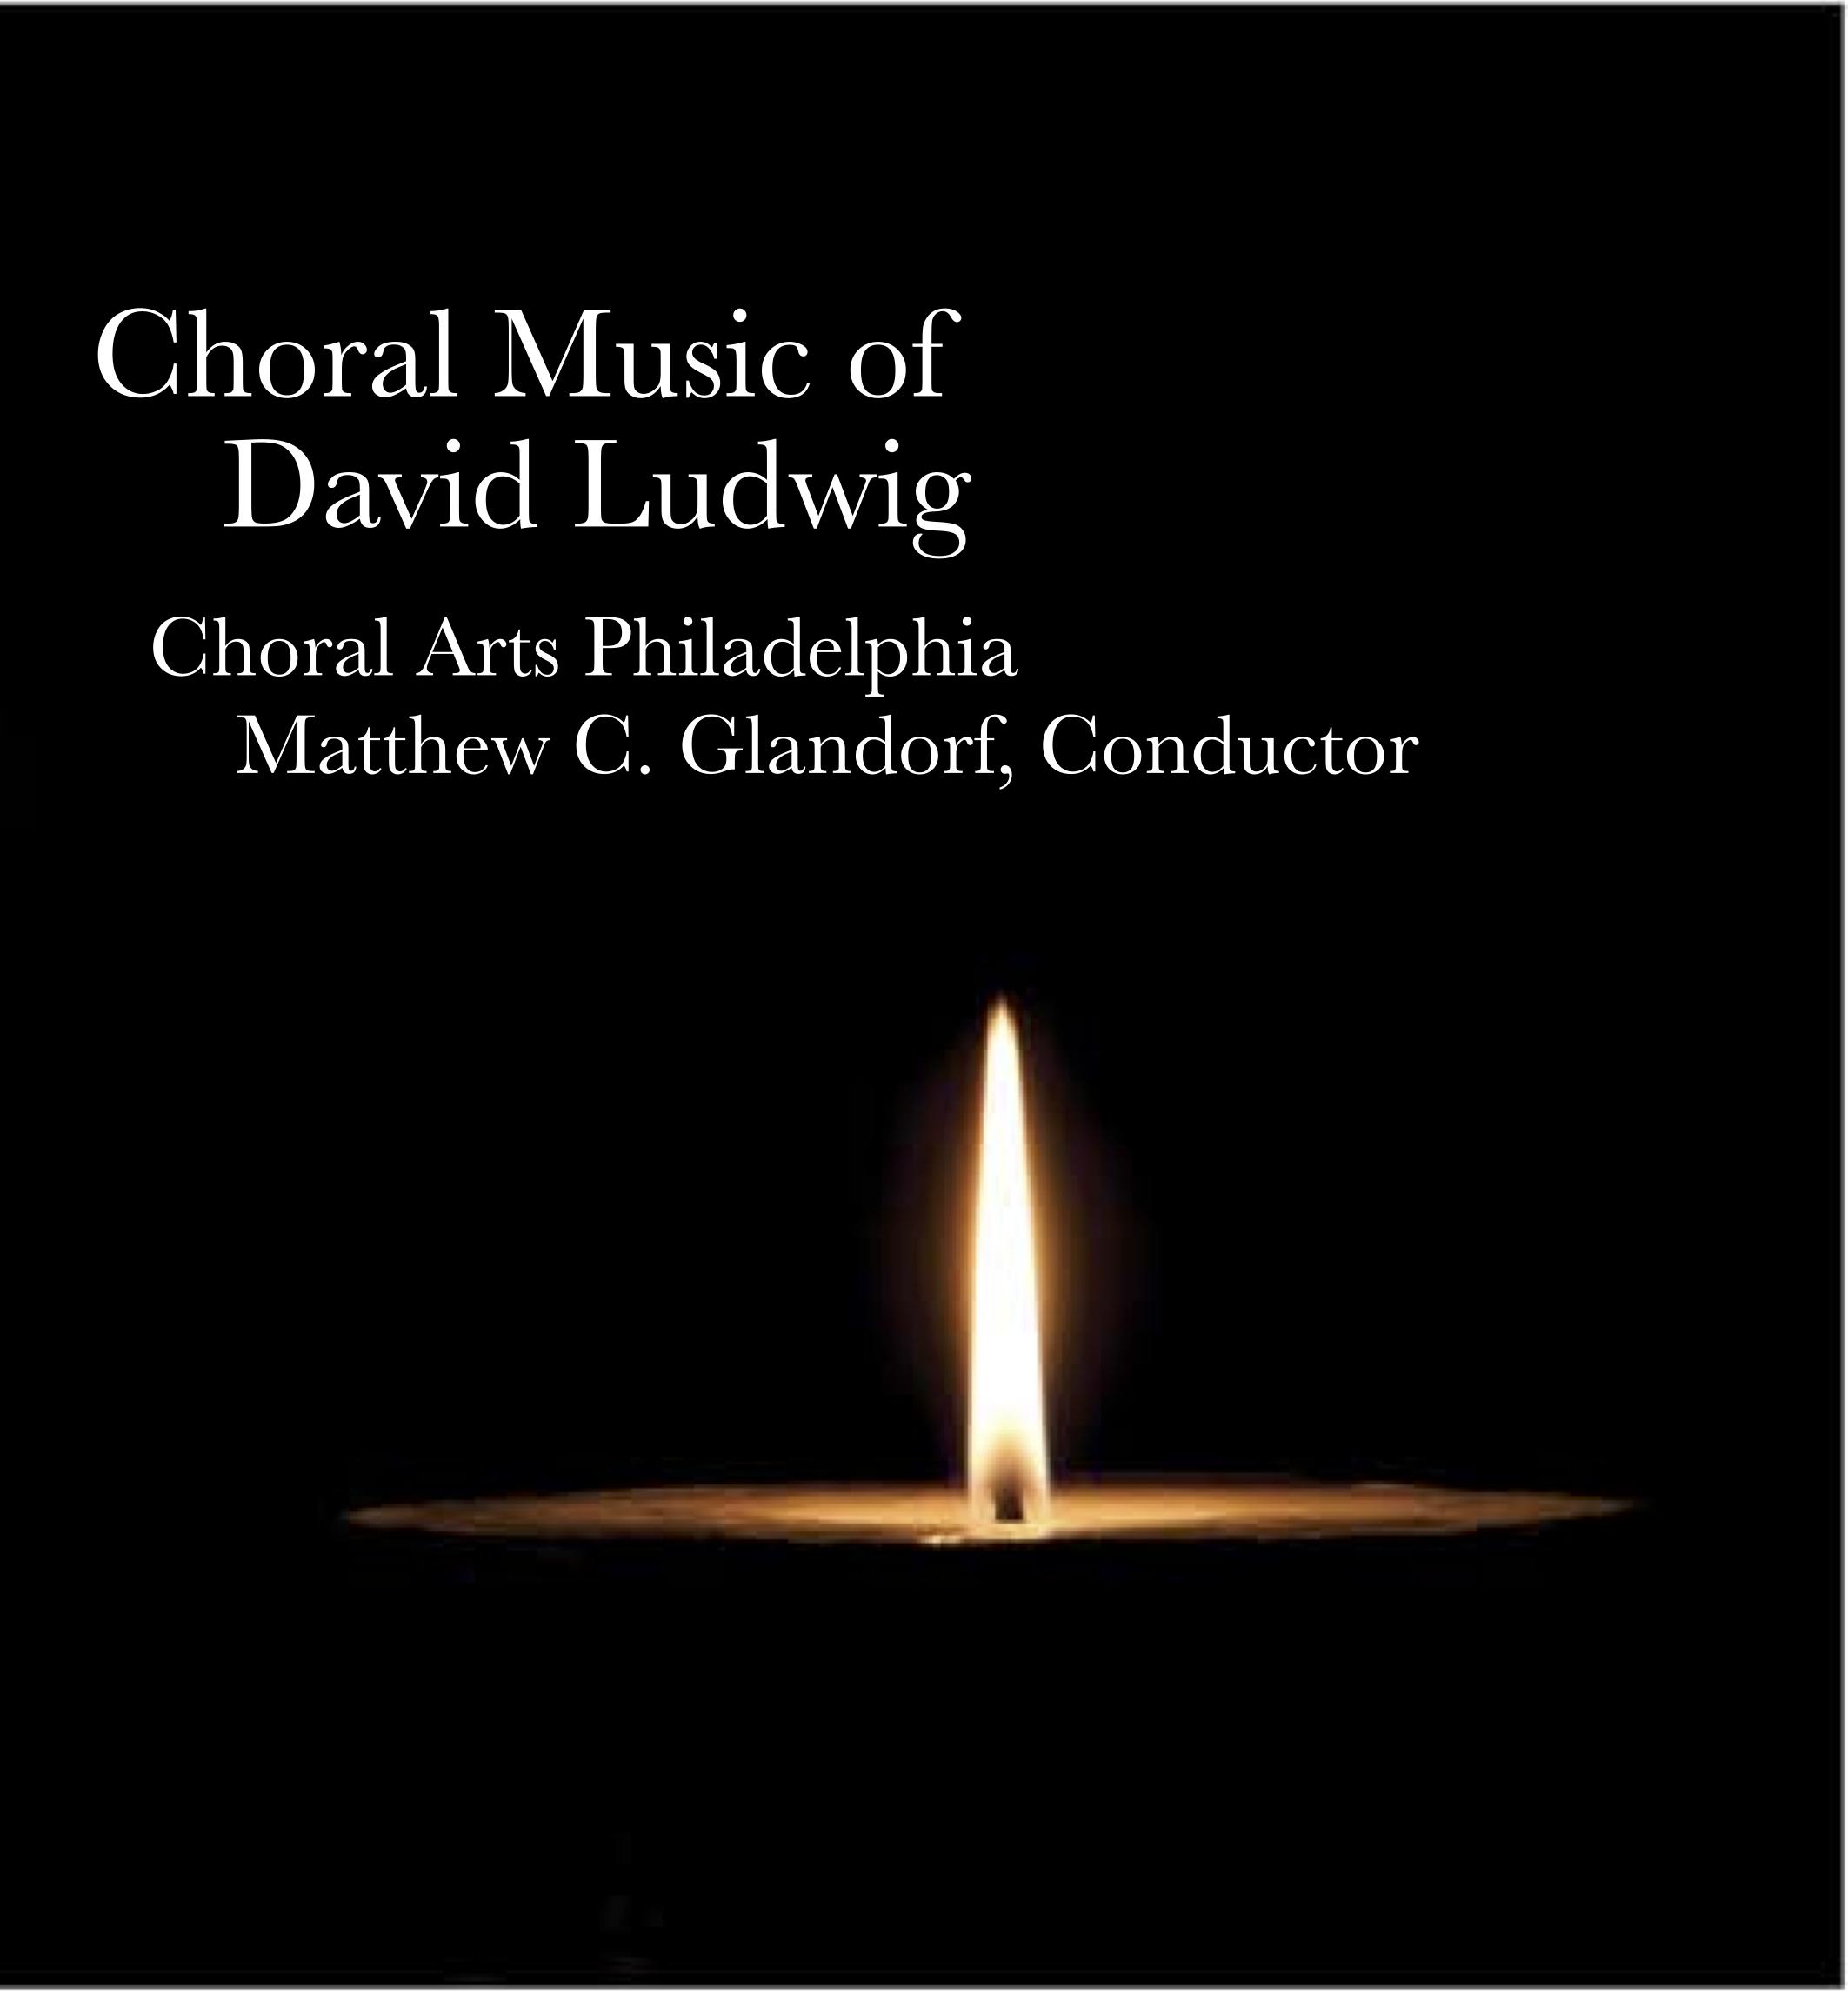 Choral Music CD Cover.jpg